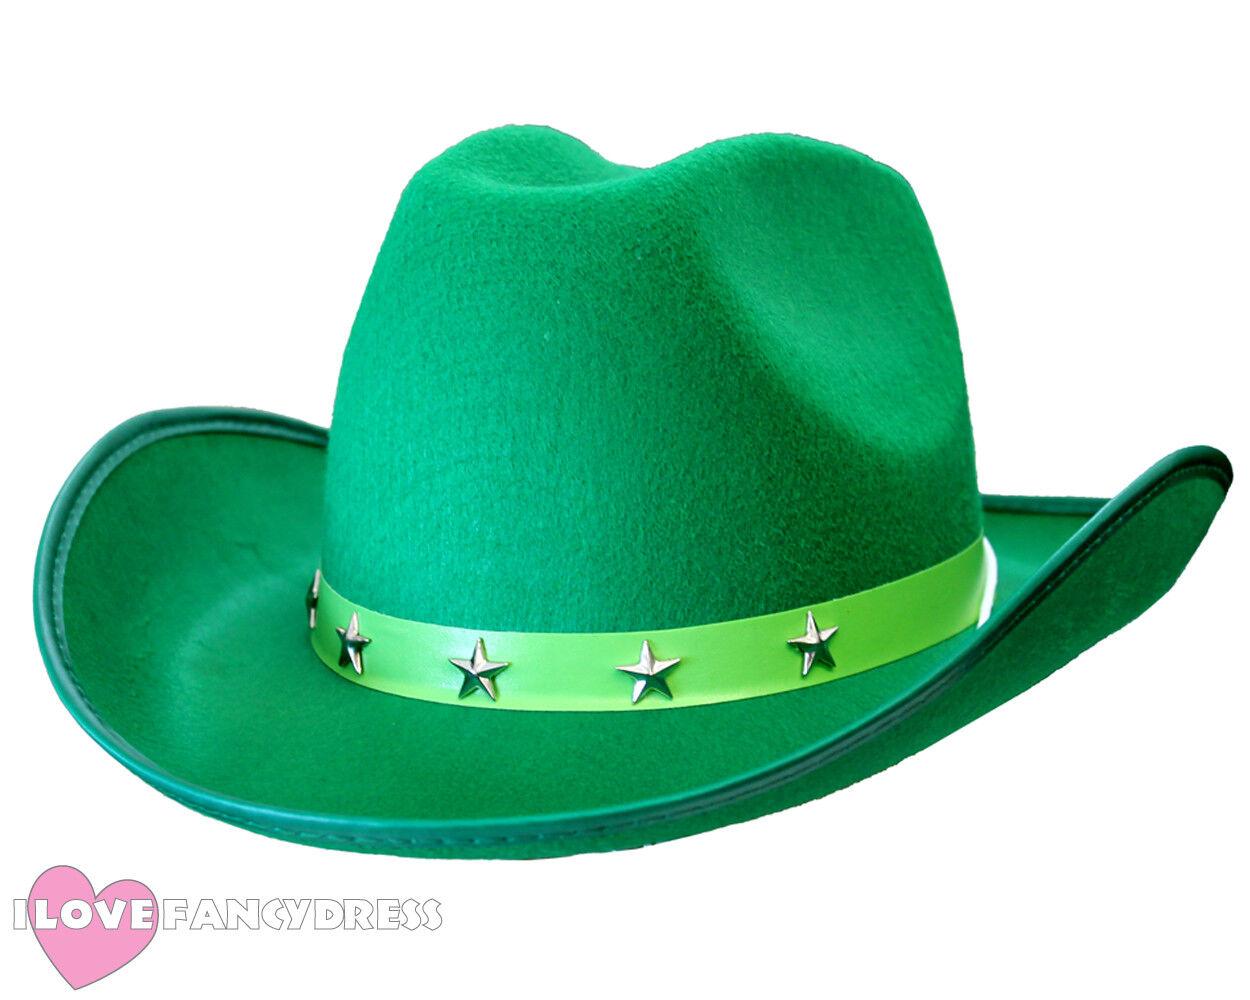 GREEN STAR STUDDED COWBOY HAT WILD WEST WESTERN COWGIRL FANCY DRESS ST  PATRICKS 92e2f94e0549